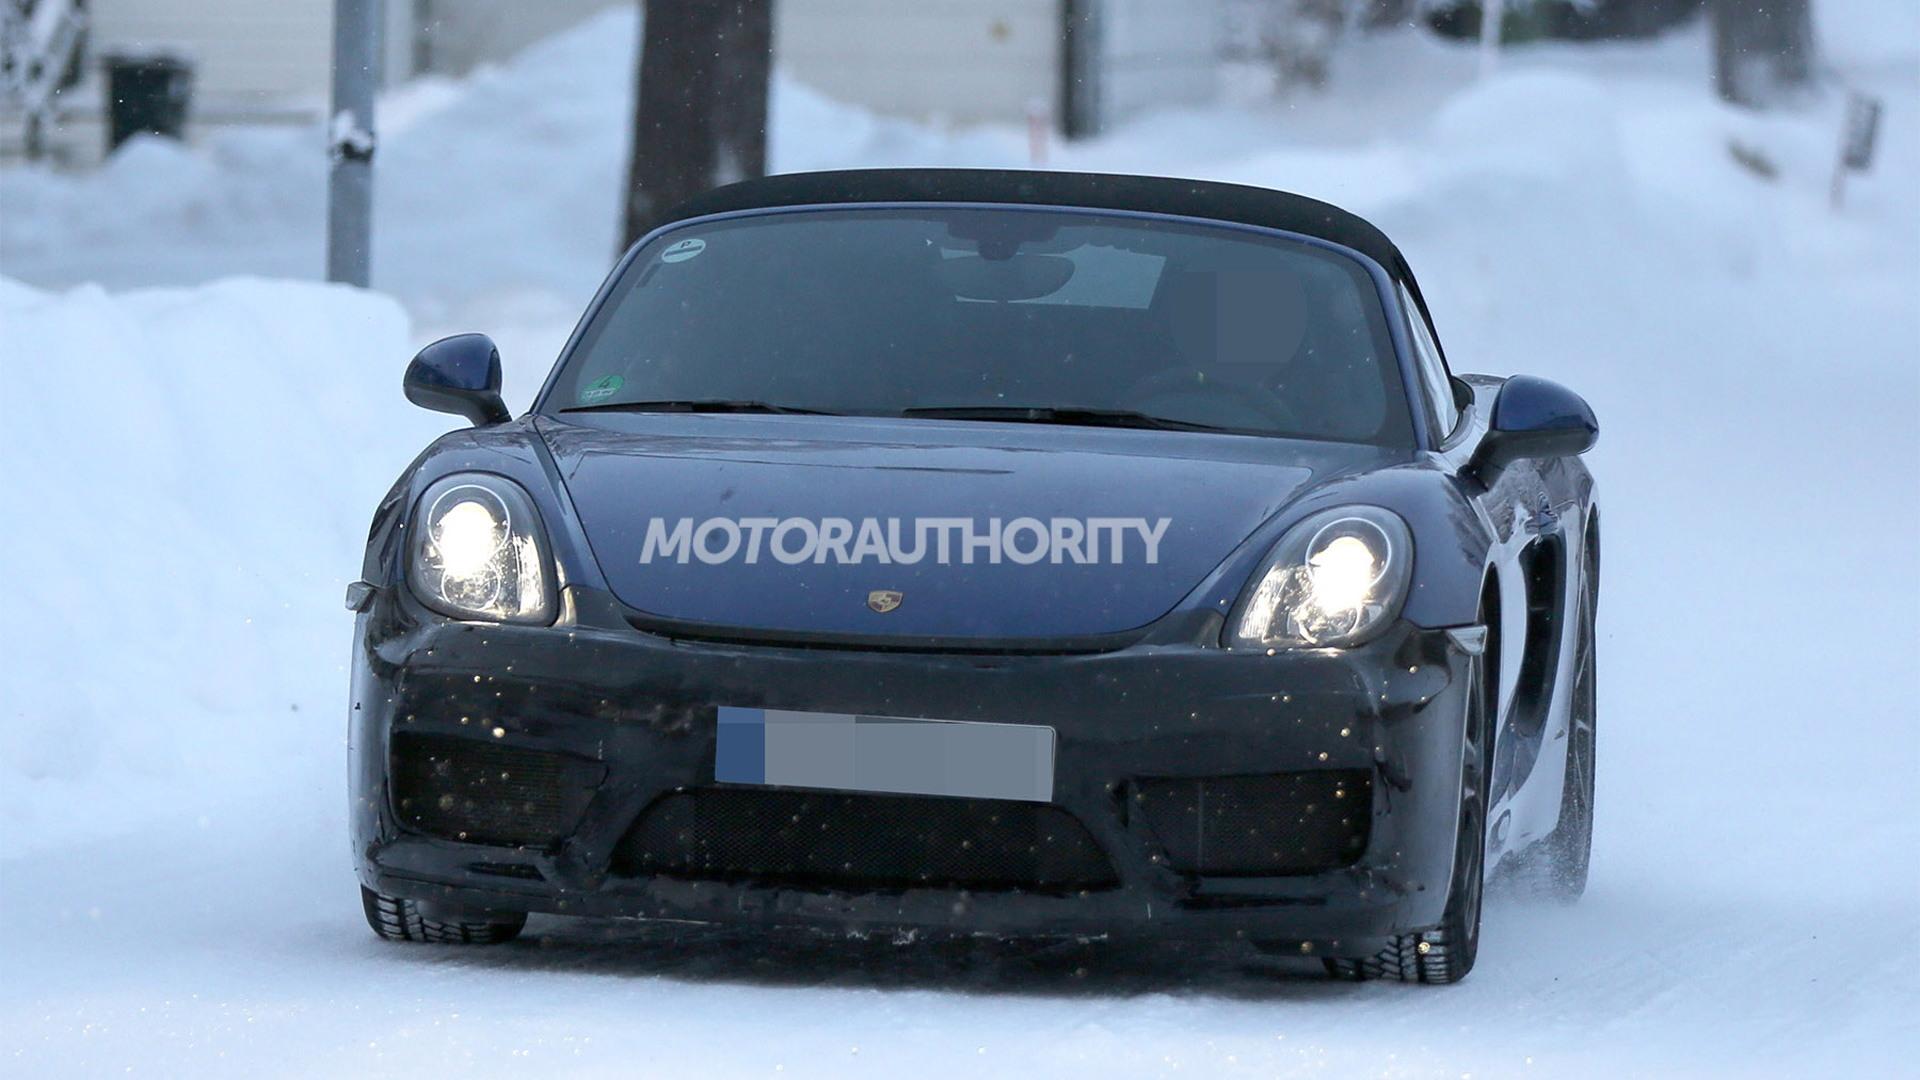 2016 Porsche Boxster RS Spyder spy shots - Image via S. Baldauf/SB-Medien